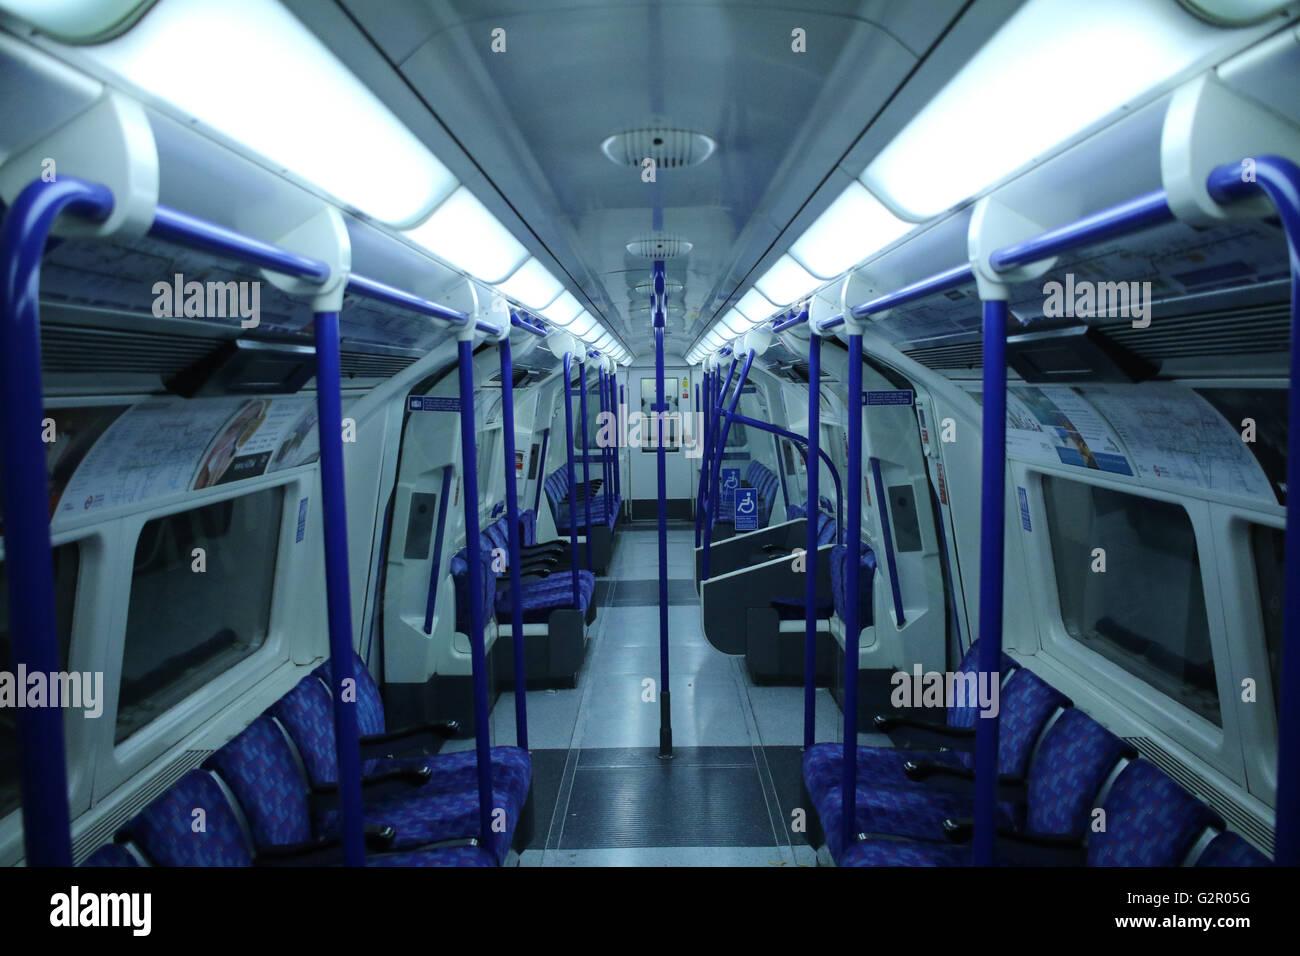 London underground northern line tube train at night - Stock Image